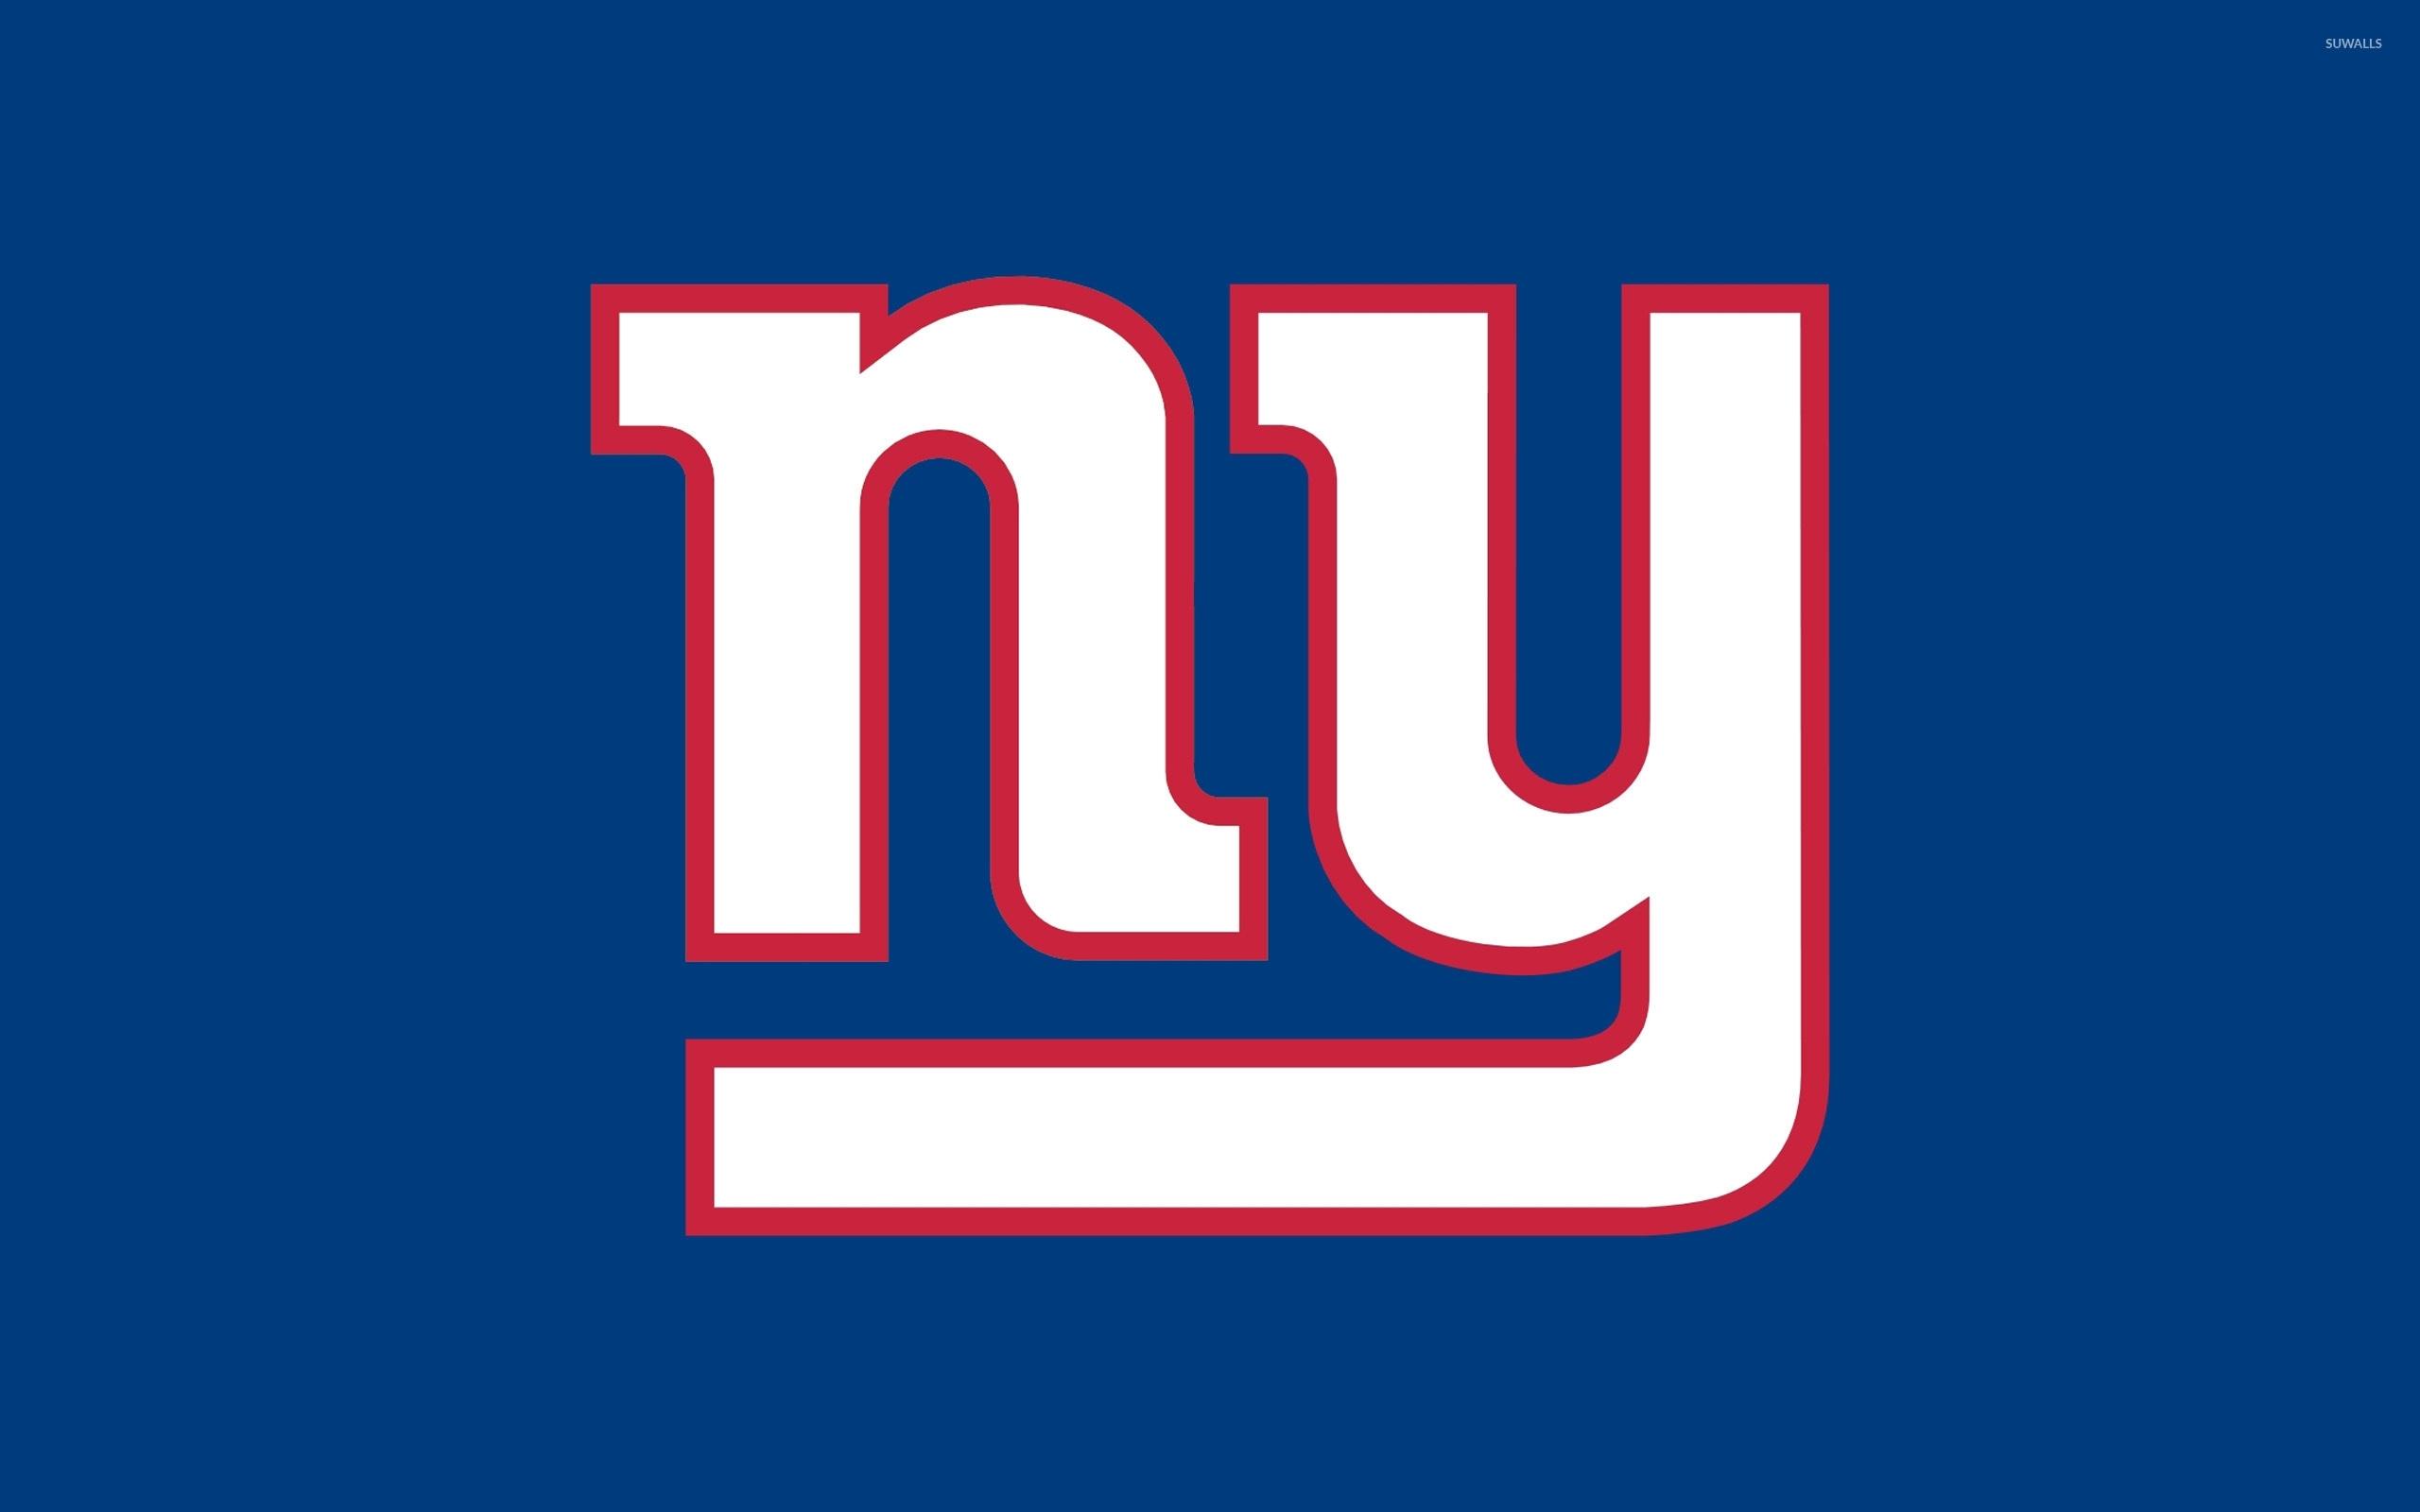 new york giants logo wallpaper - sport wallpapers - #53465